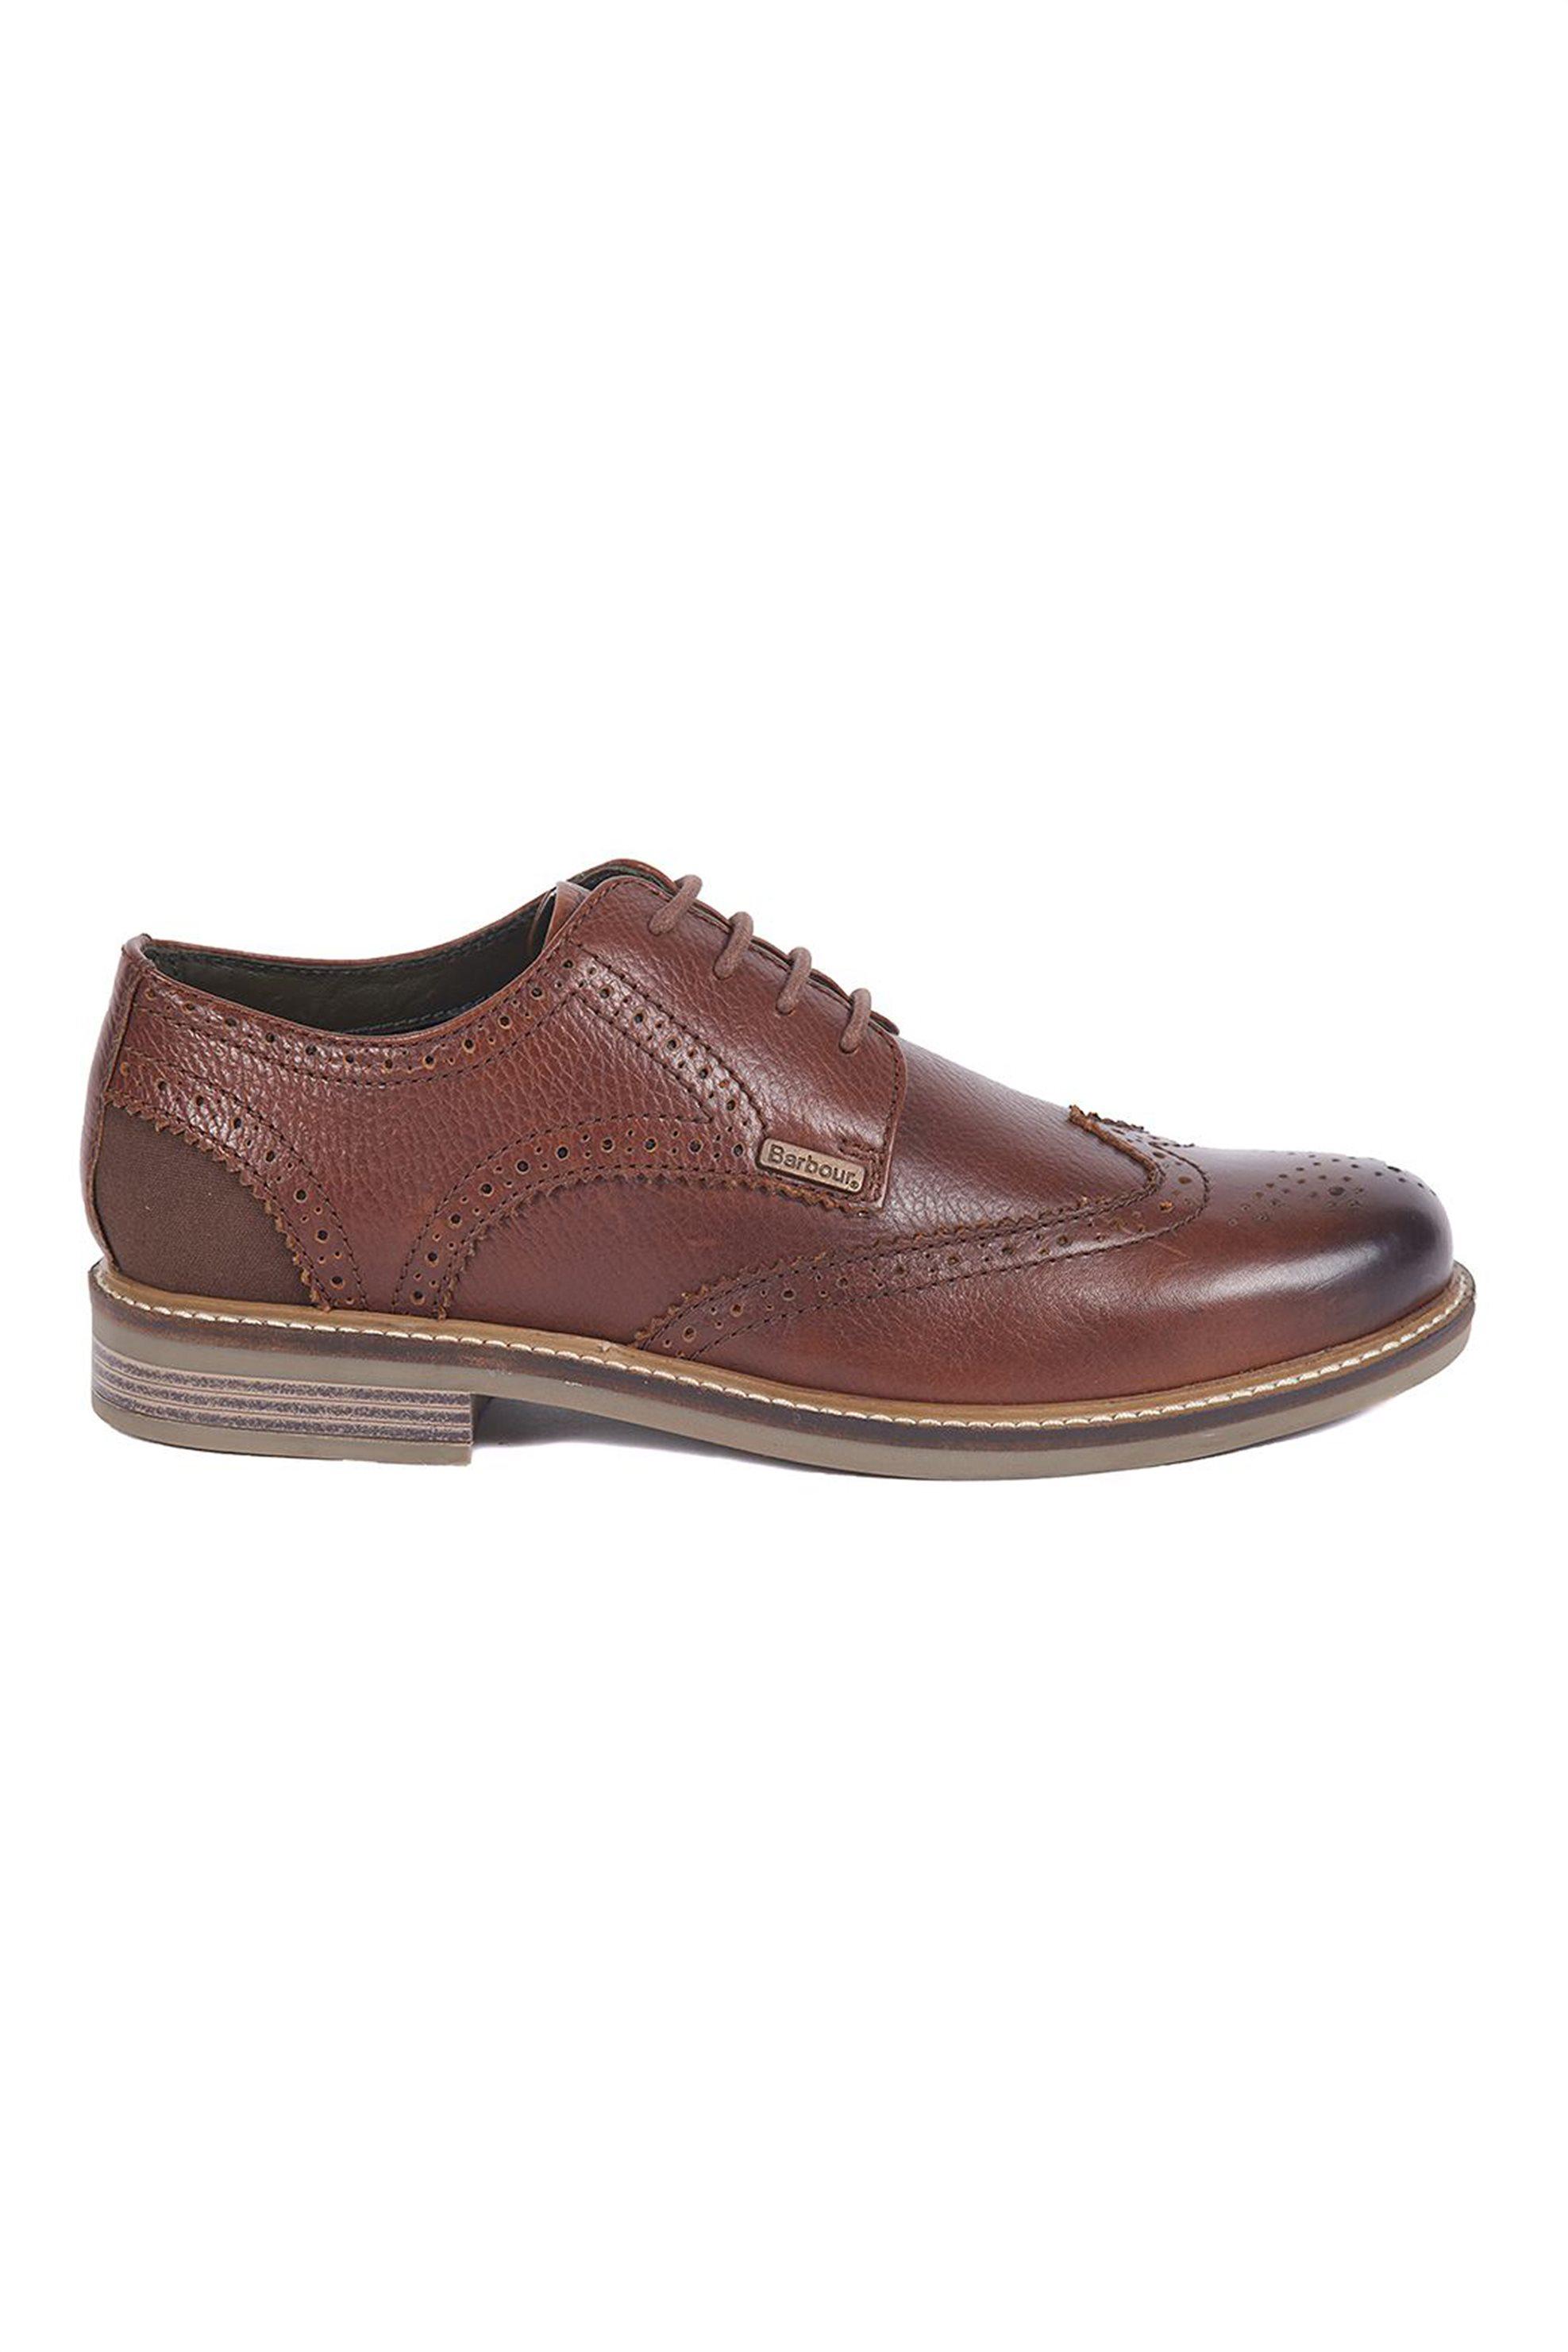 "Barbour ανδρικά παπούτσια Oxford 'Bamburgh"" – MFO0418 – Καφέ"